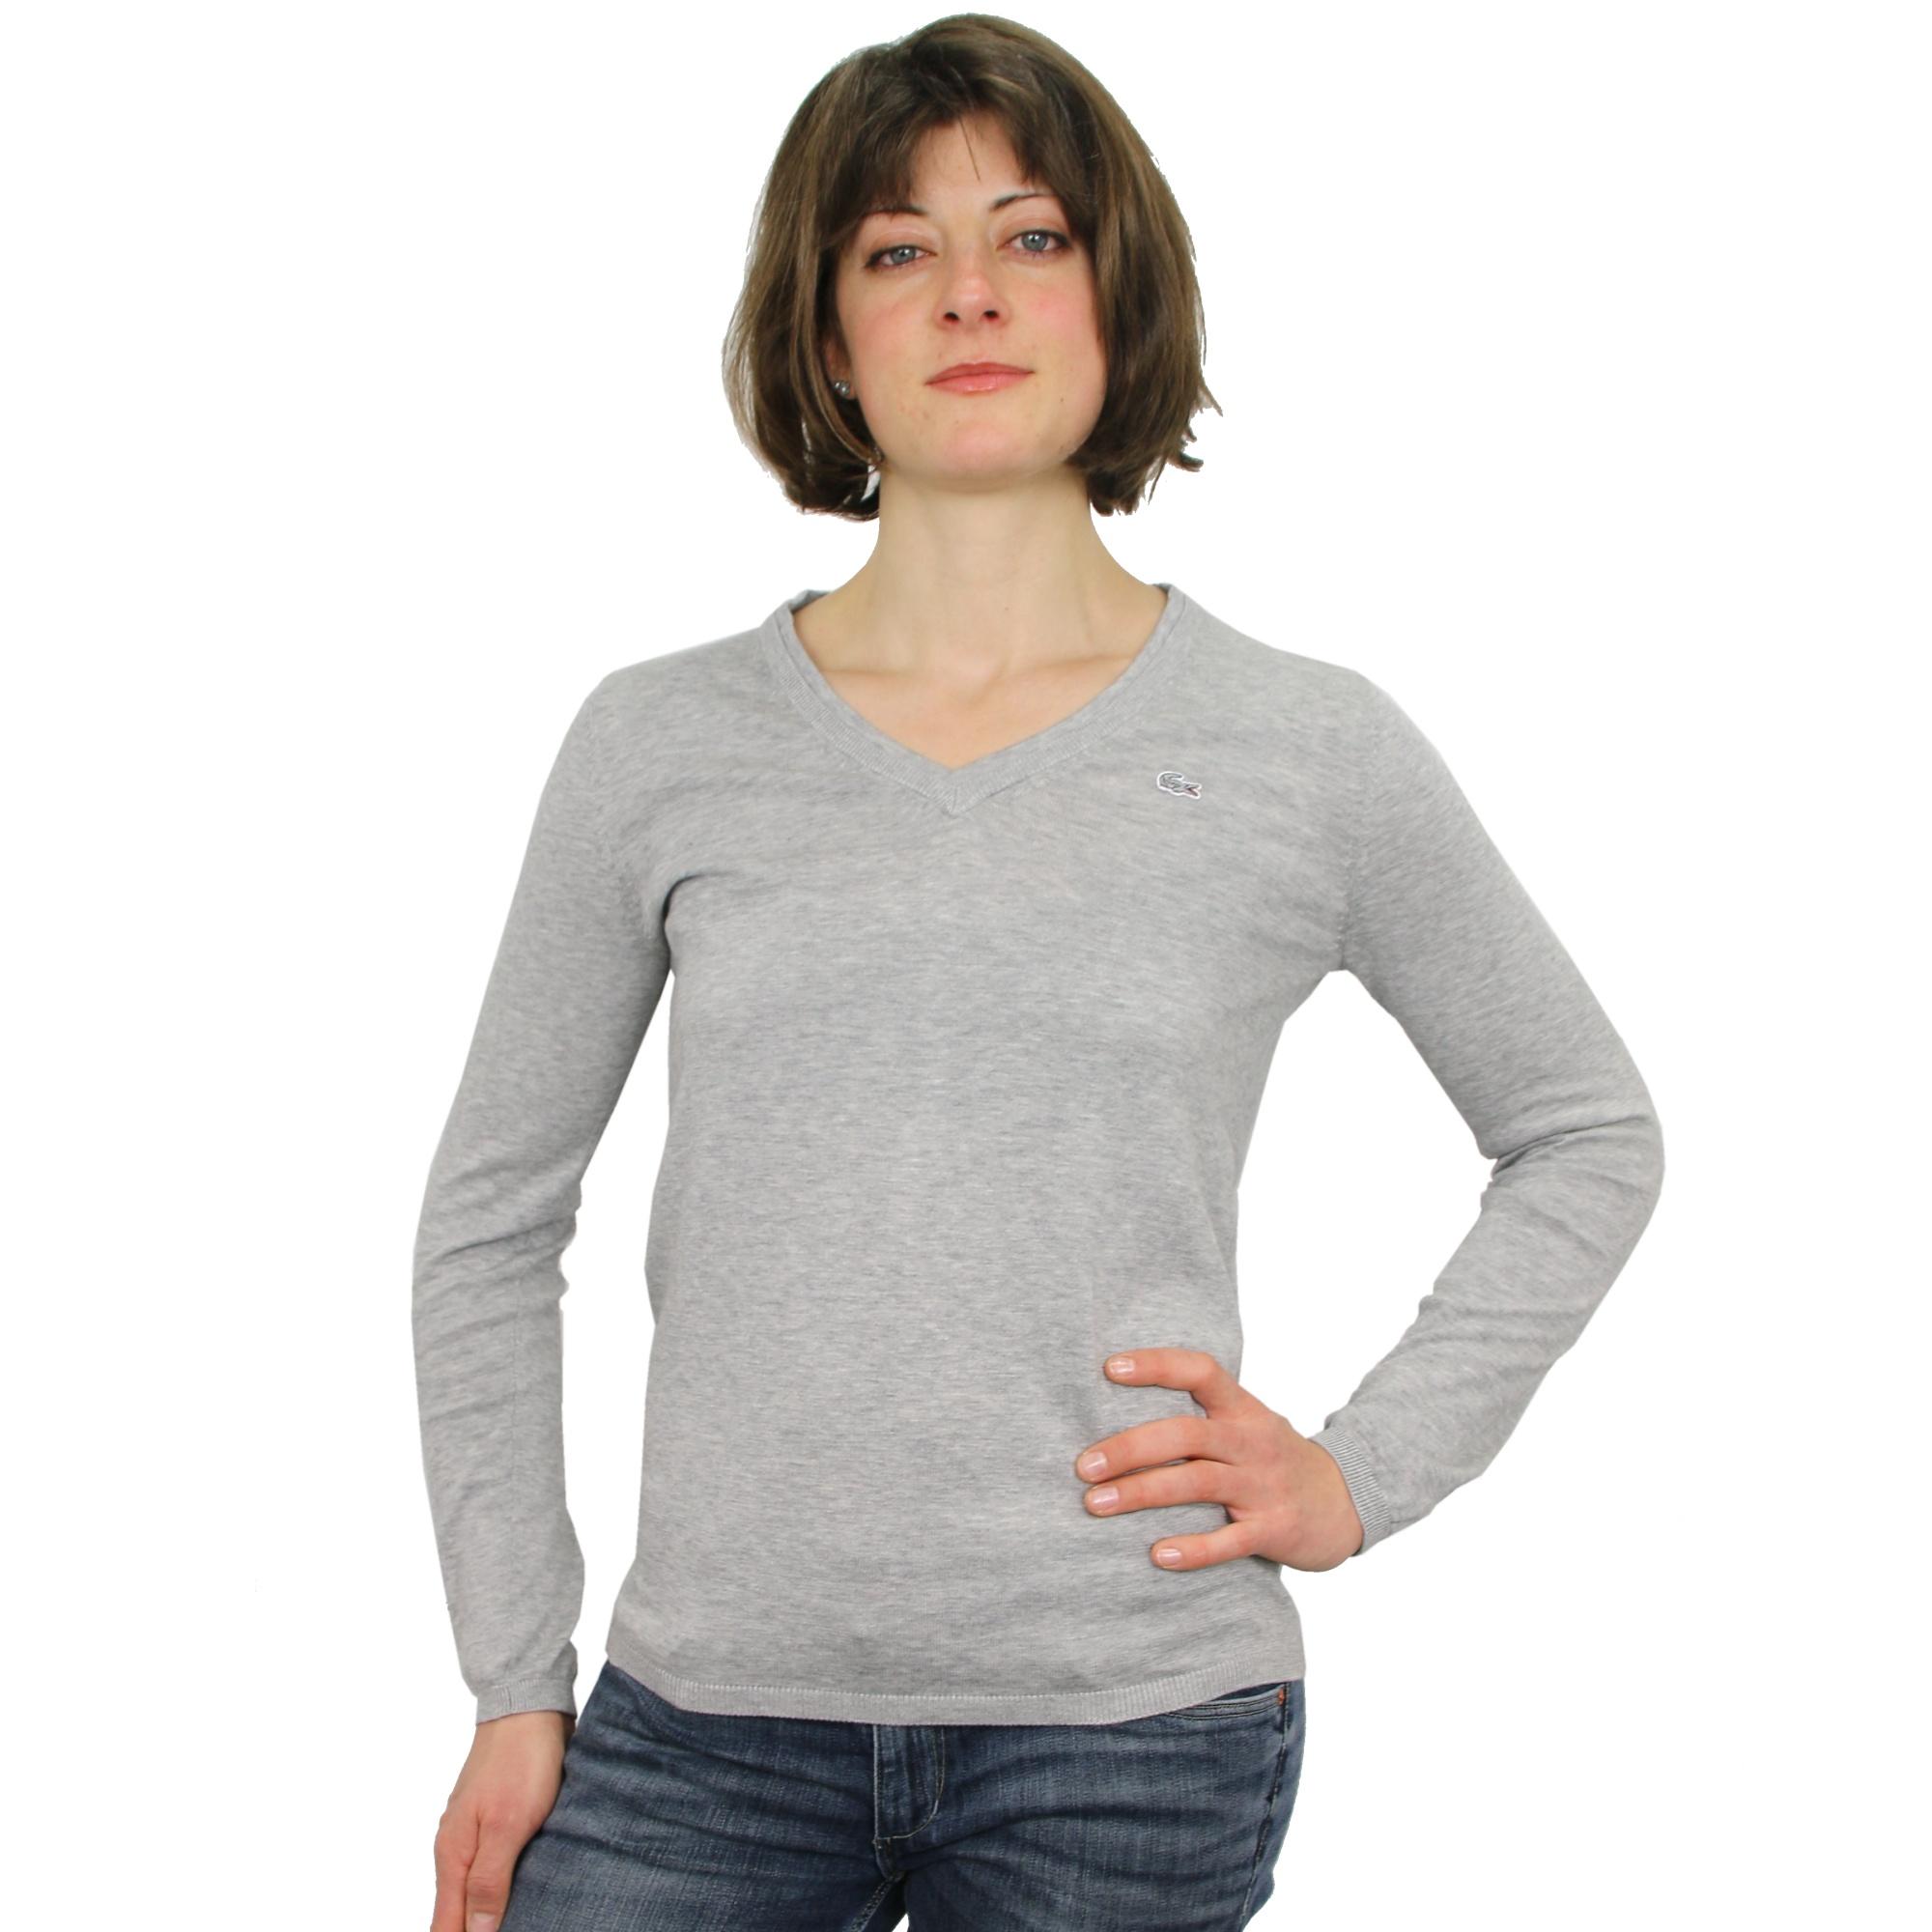 lacoste sweater pullover v ausschnitt damen ebay. Black Bedroom Furniture Sets. Home Design Ideas